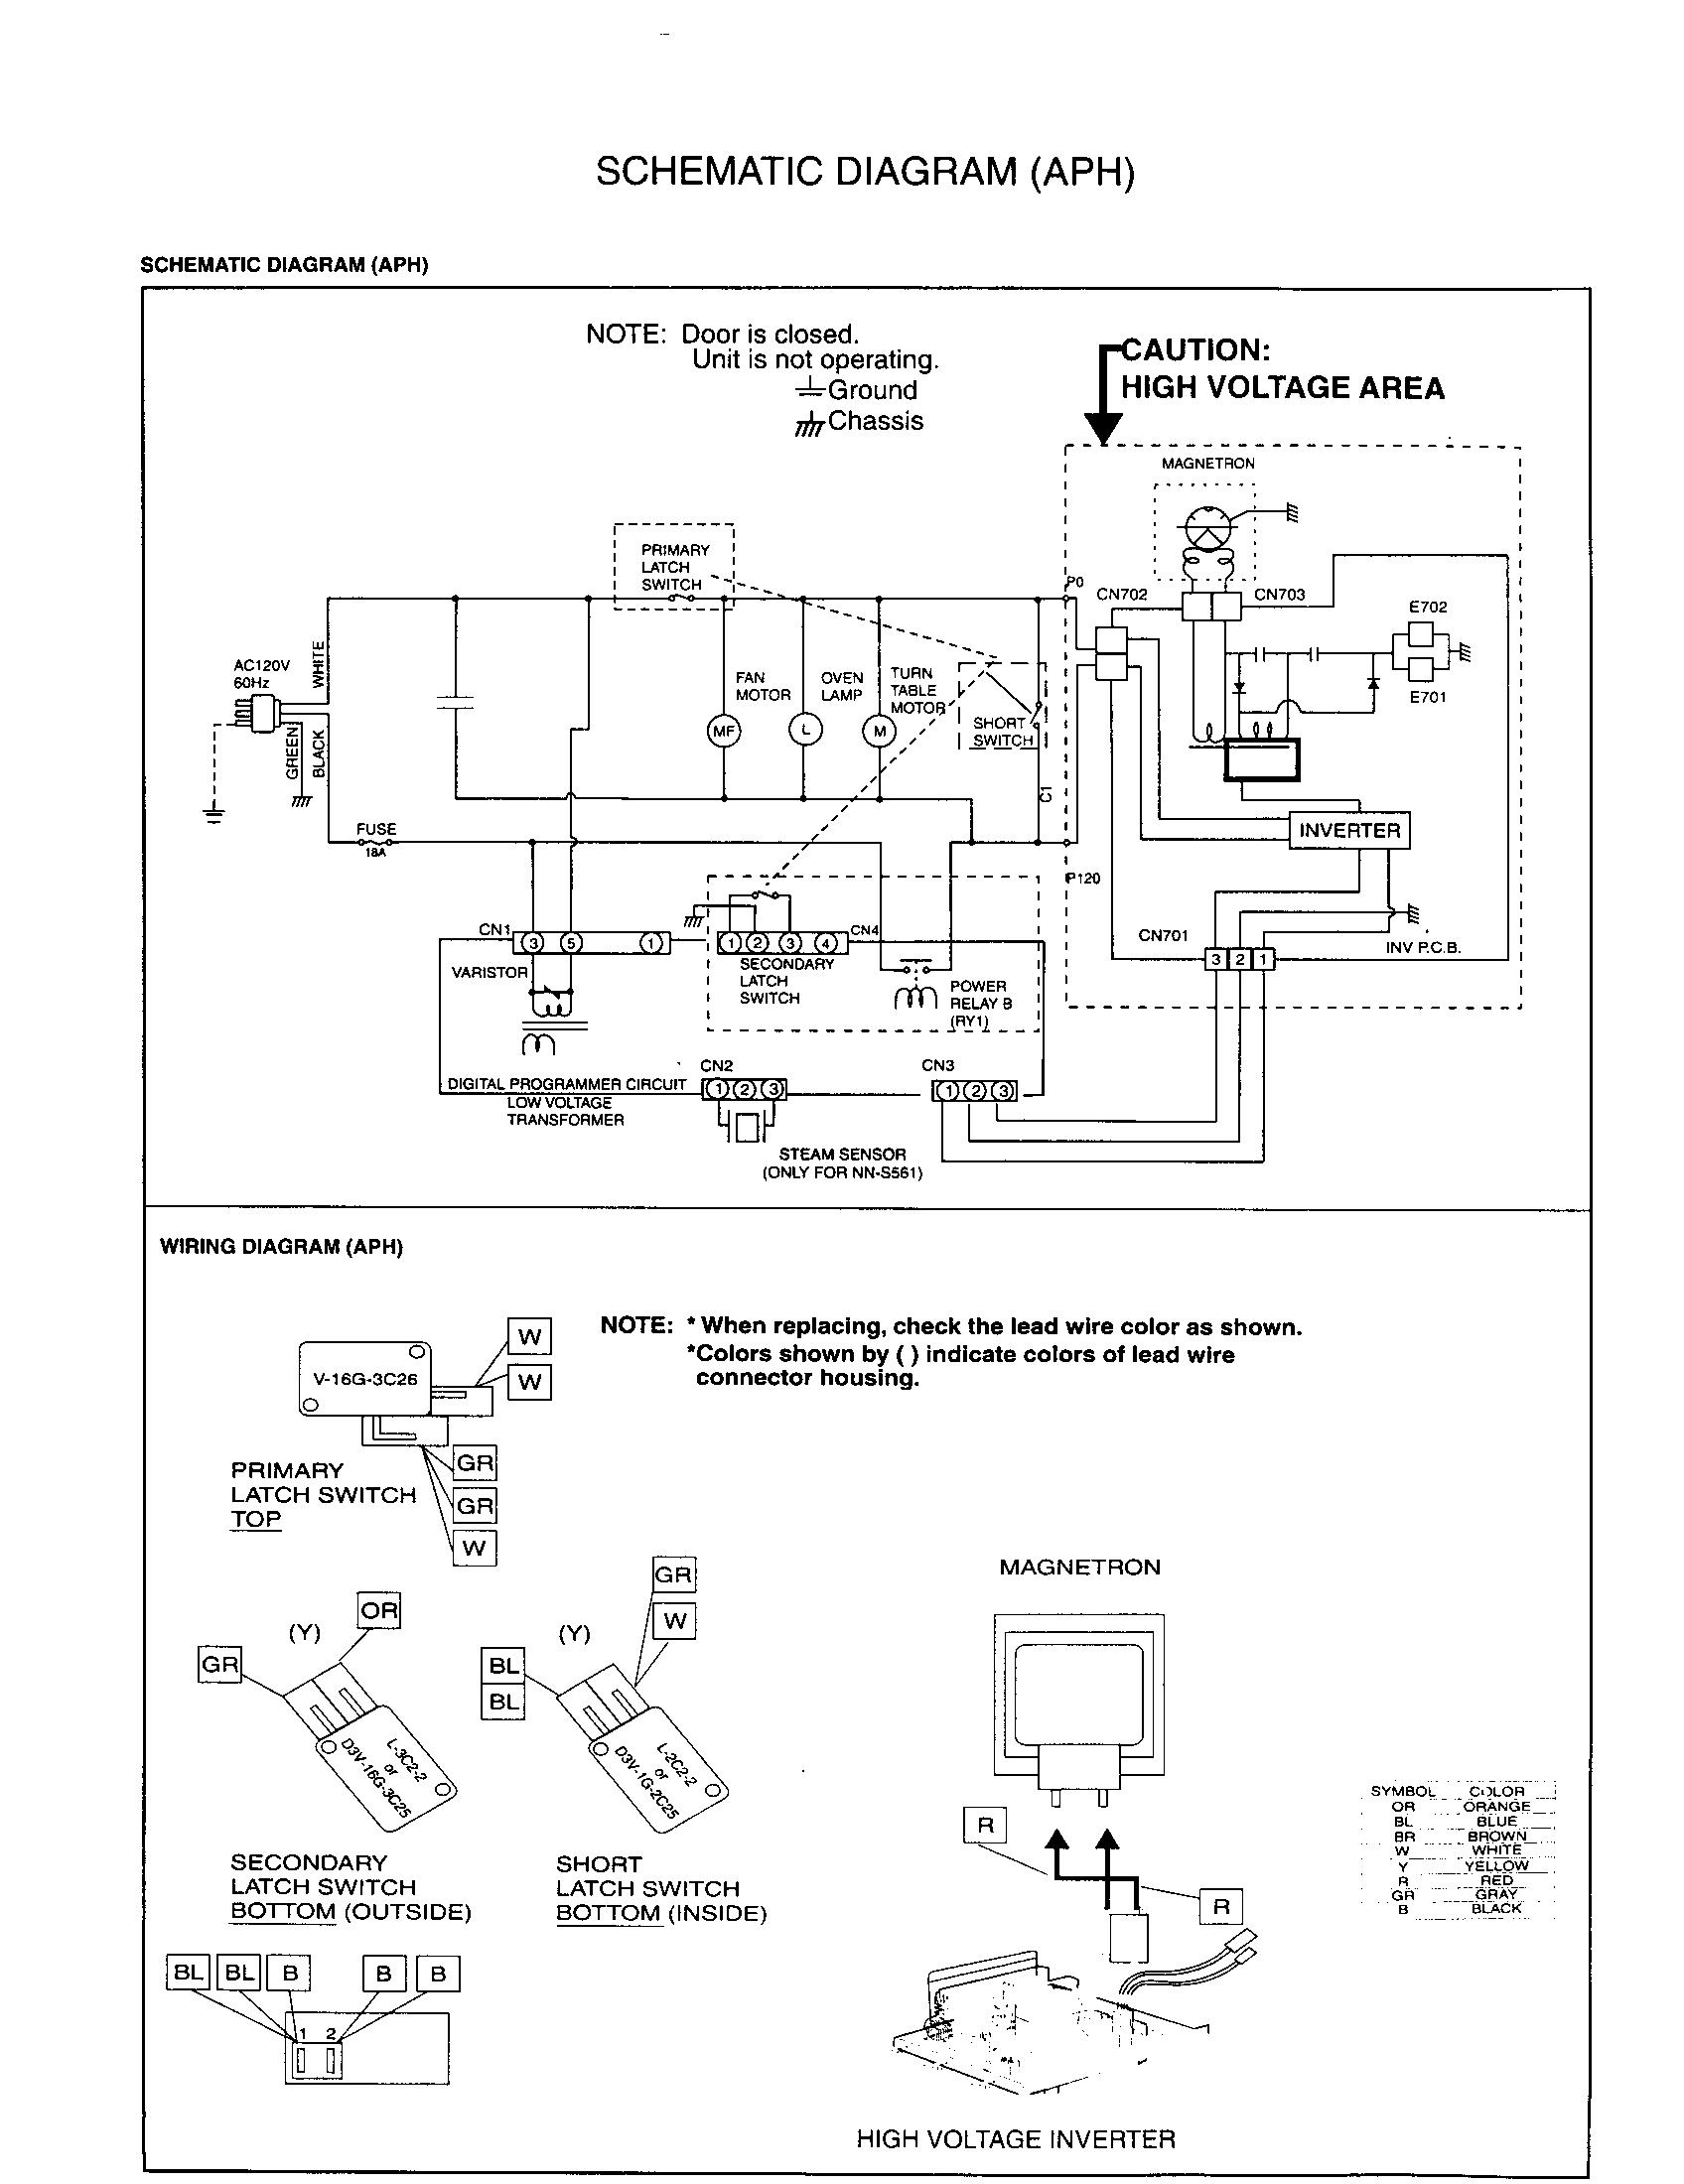 Panasonic model NN-S541BF countertop microwave genuine parts